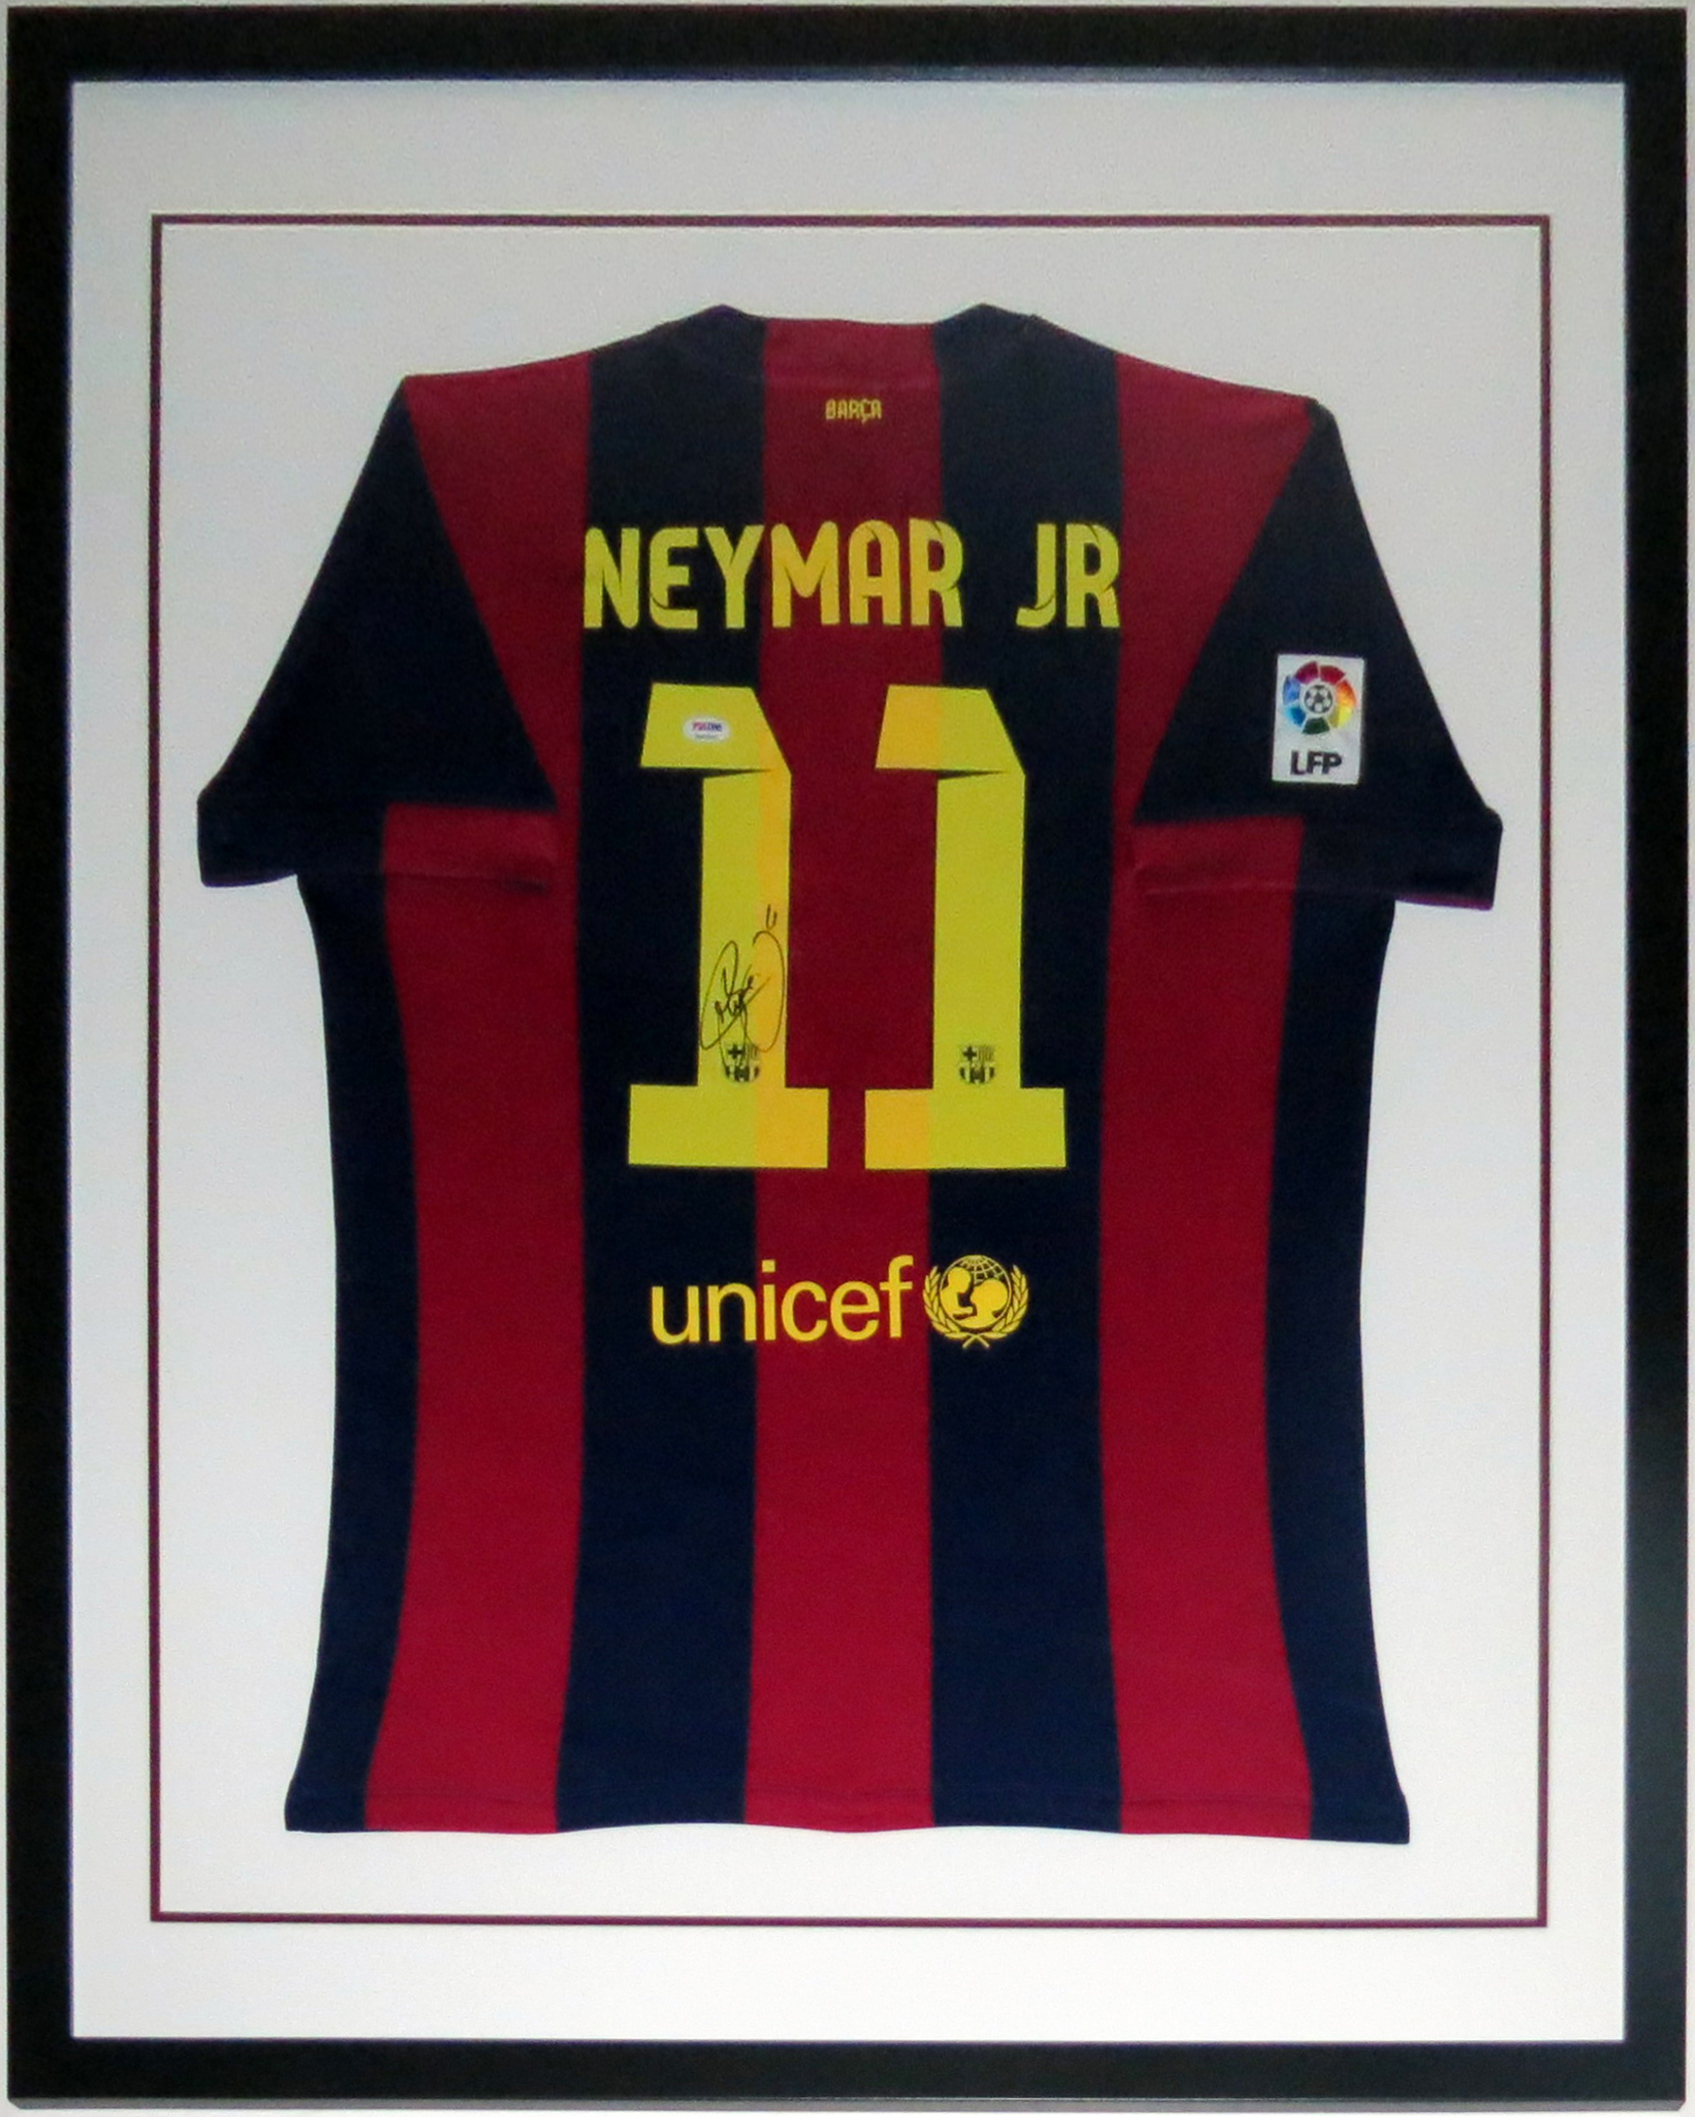 Neymar Jr. Signed FC Barcelona Jersey - PSA DNA COA Authenticated - Professionally Framed 34x42